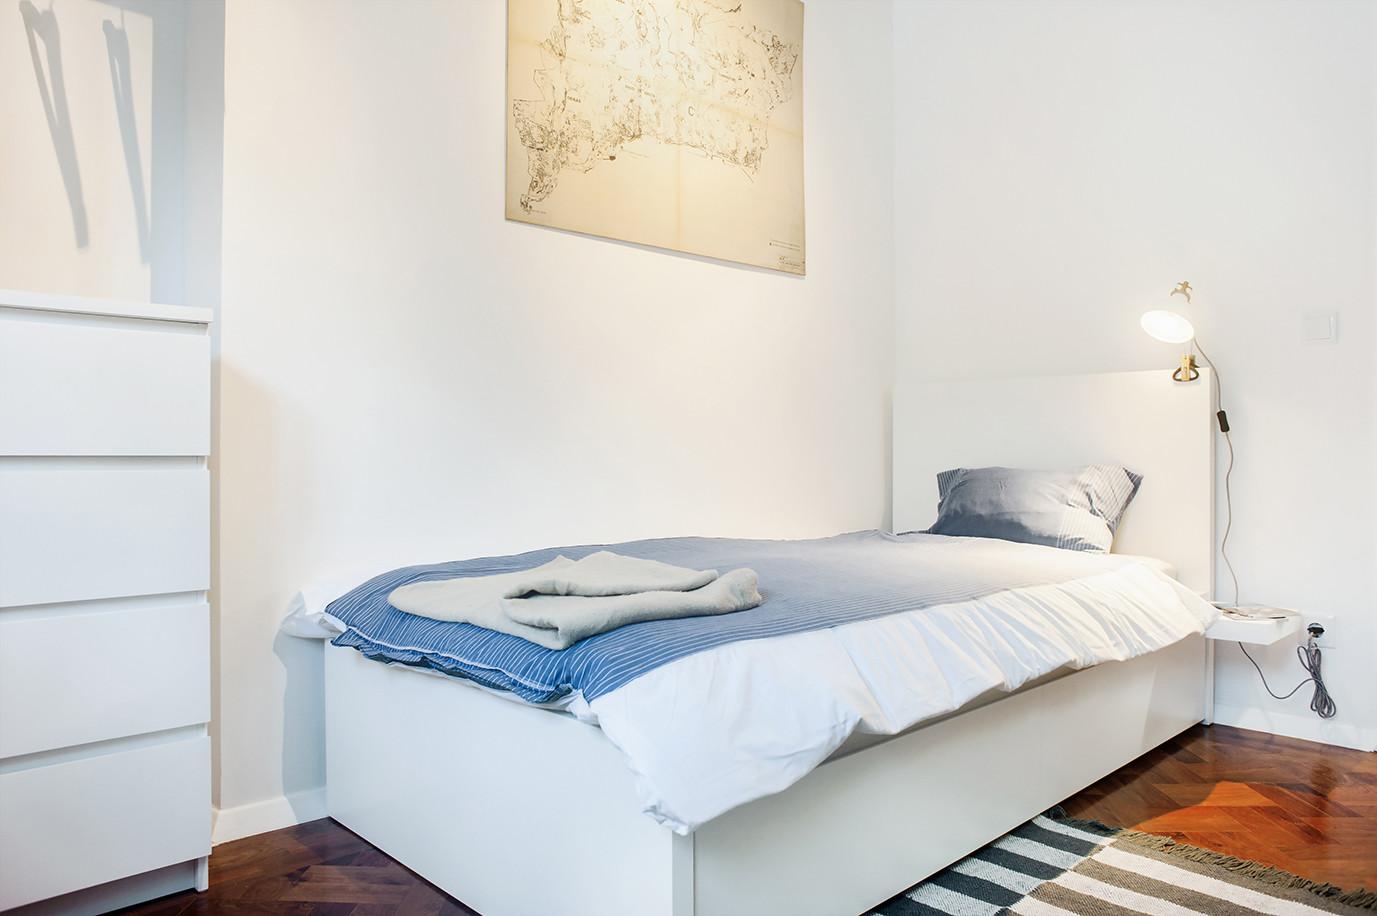 single-bedroom-bills-included-newly-renovated-house-near-nova-campus-23527f6114ca8241b03604eb178fea69